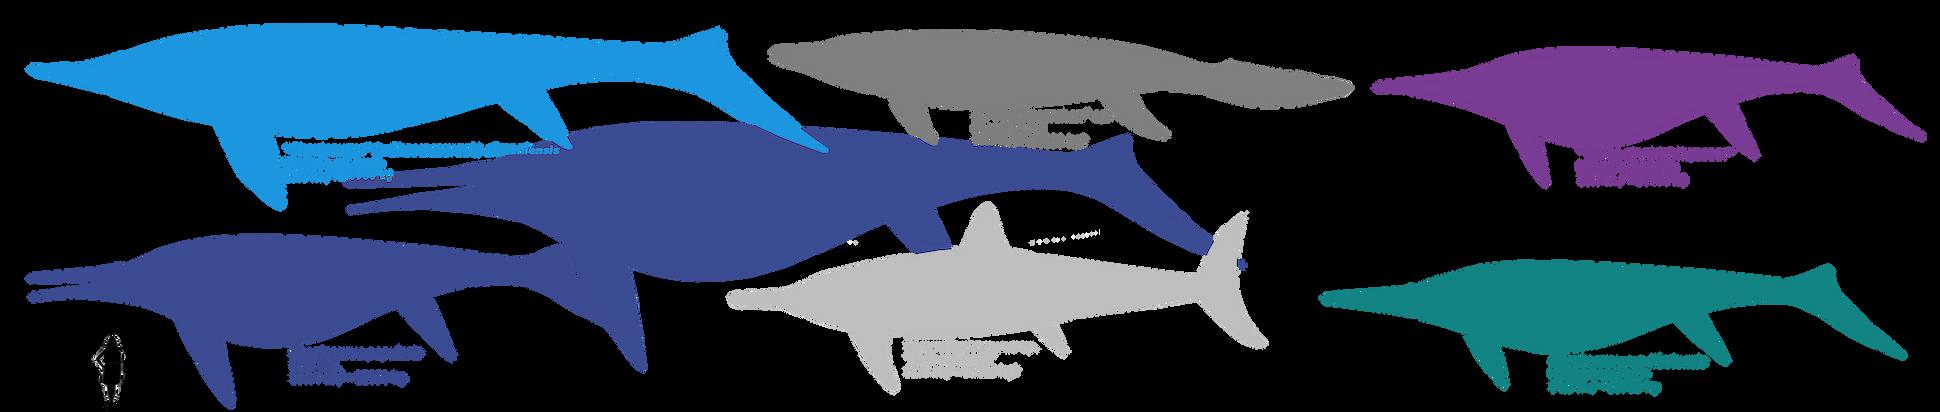 Leviathans Mk.II